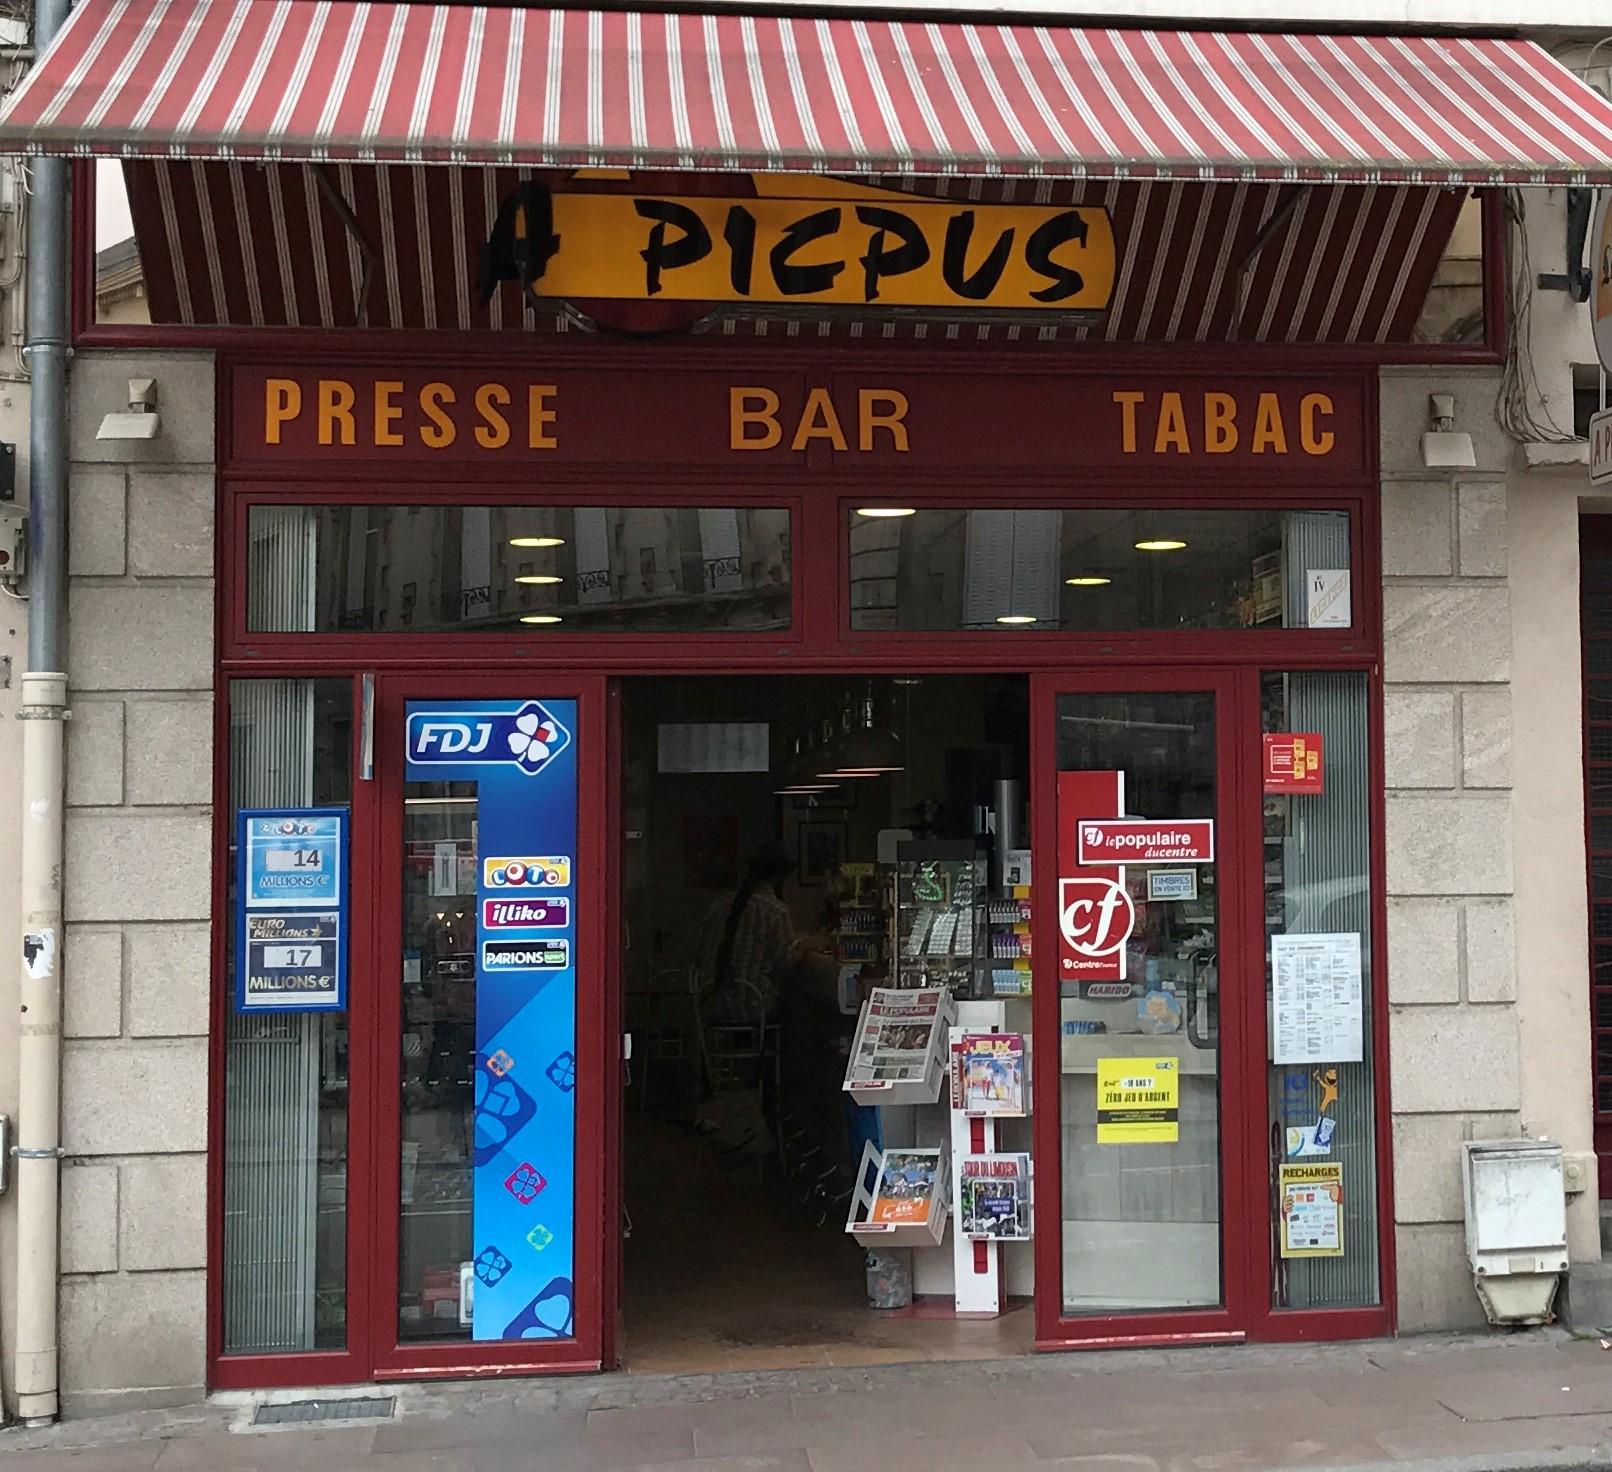 A PICPUS bureau de tabac